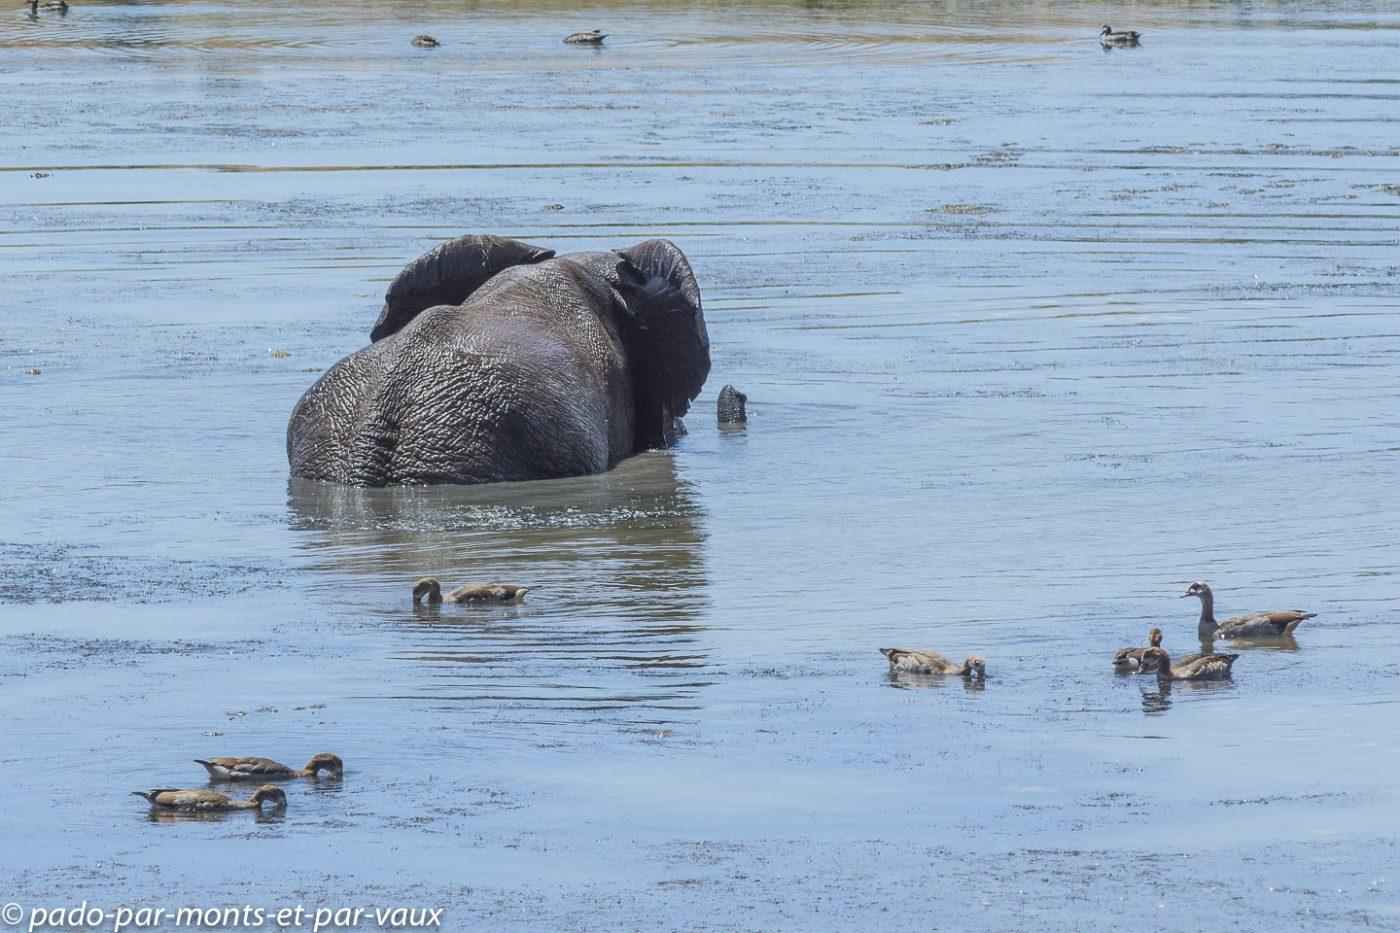 2019 Addo Elephant NP- Elephants